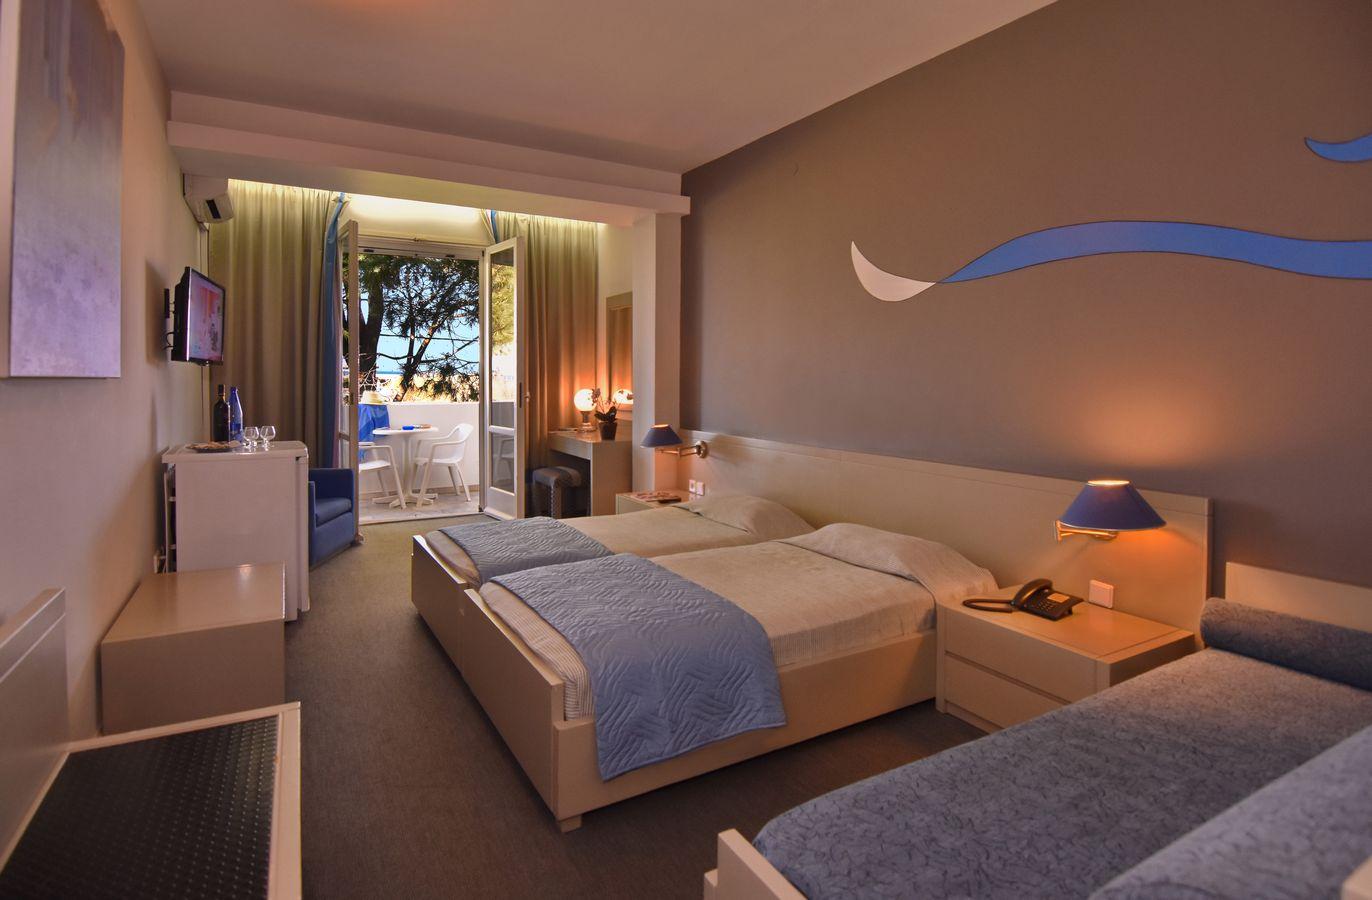 TRIPLE ROOMS